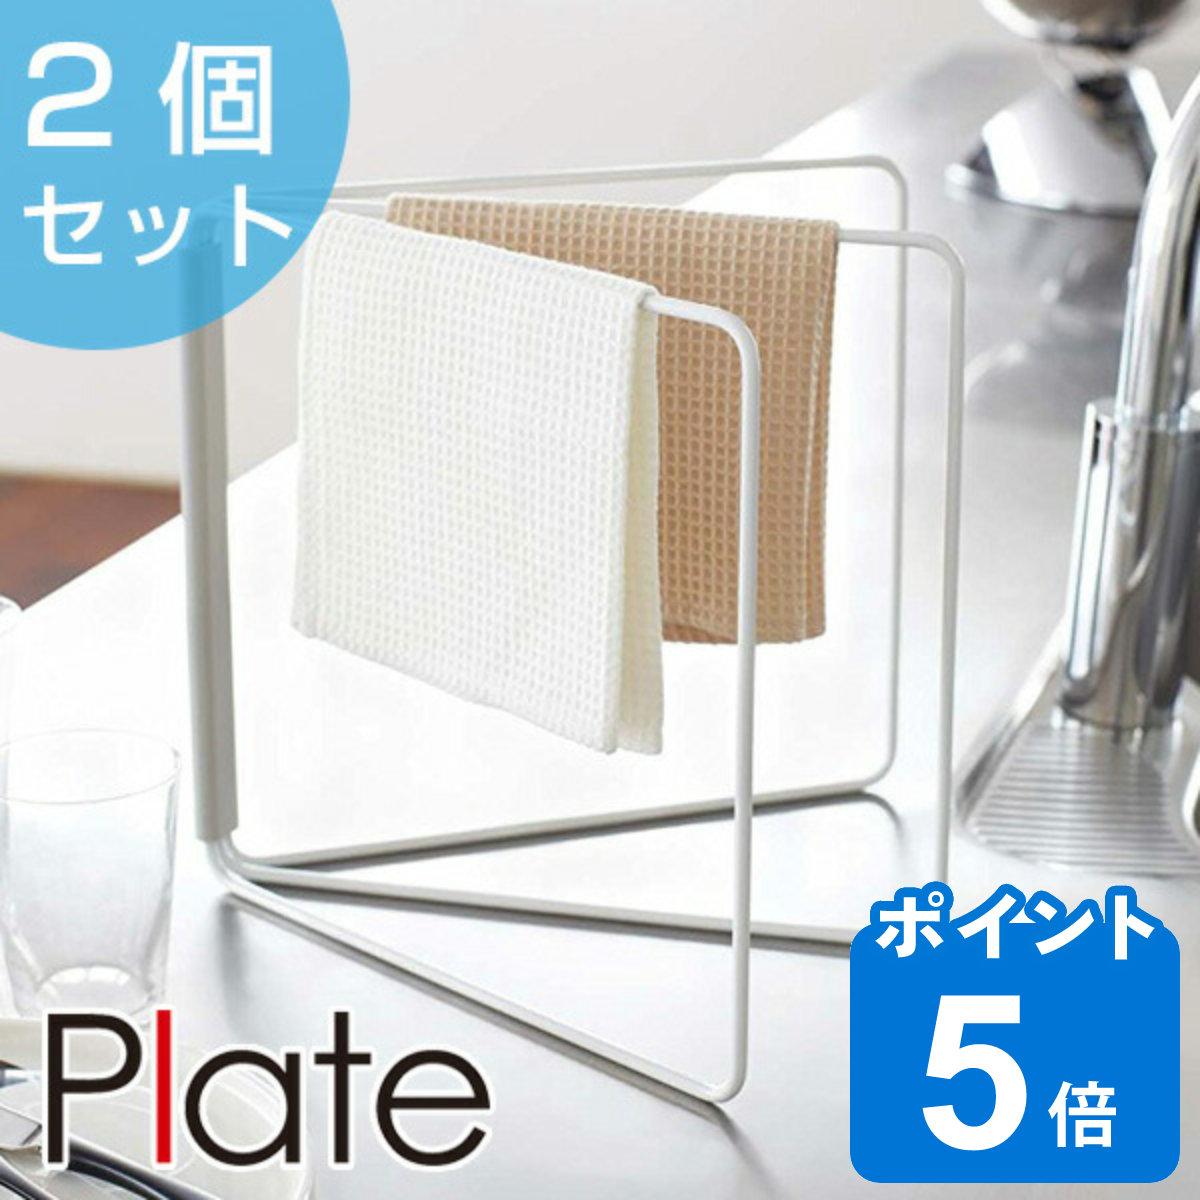 livingut: Towel rack folding cloth hangers slim plate Plate ...